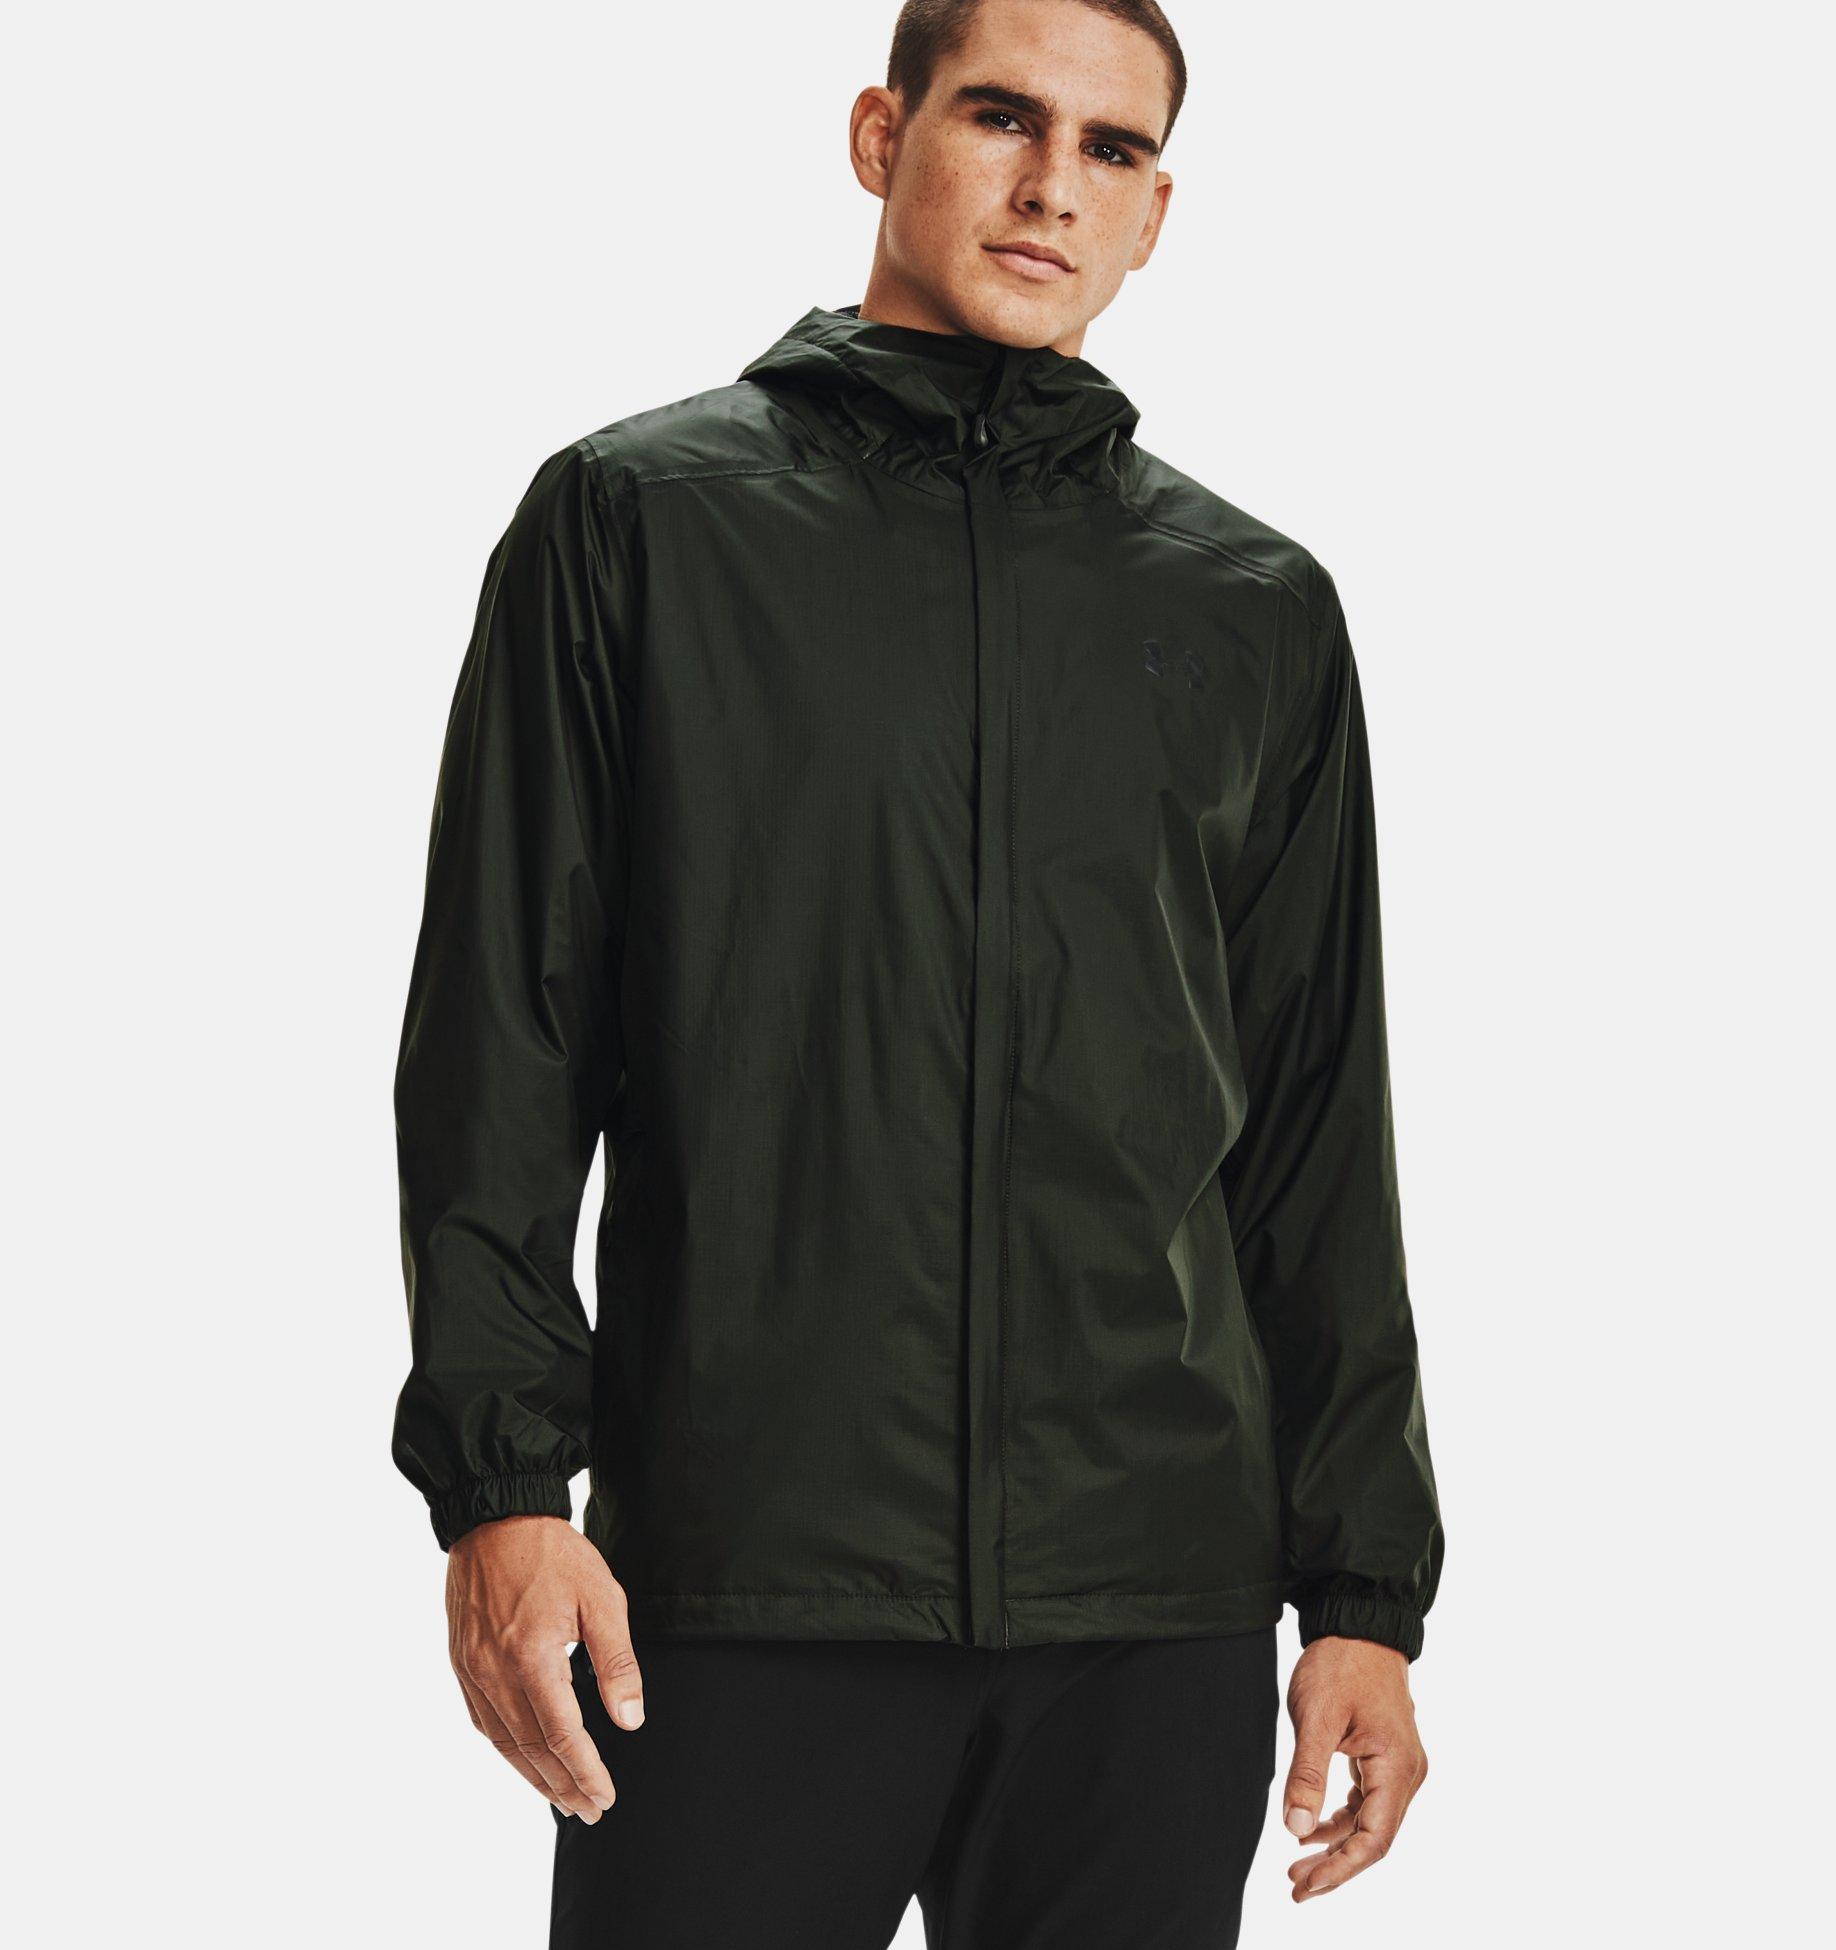 Underarmour Mens UA Storm Bora Jacket